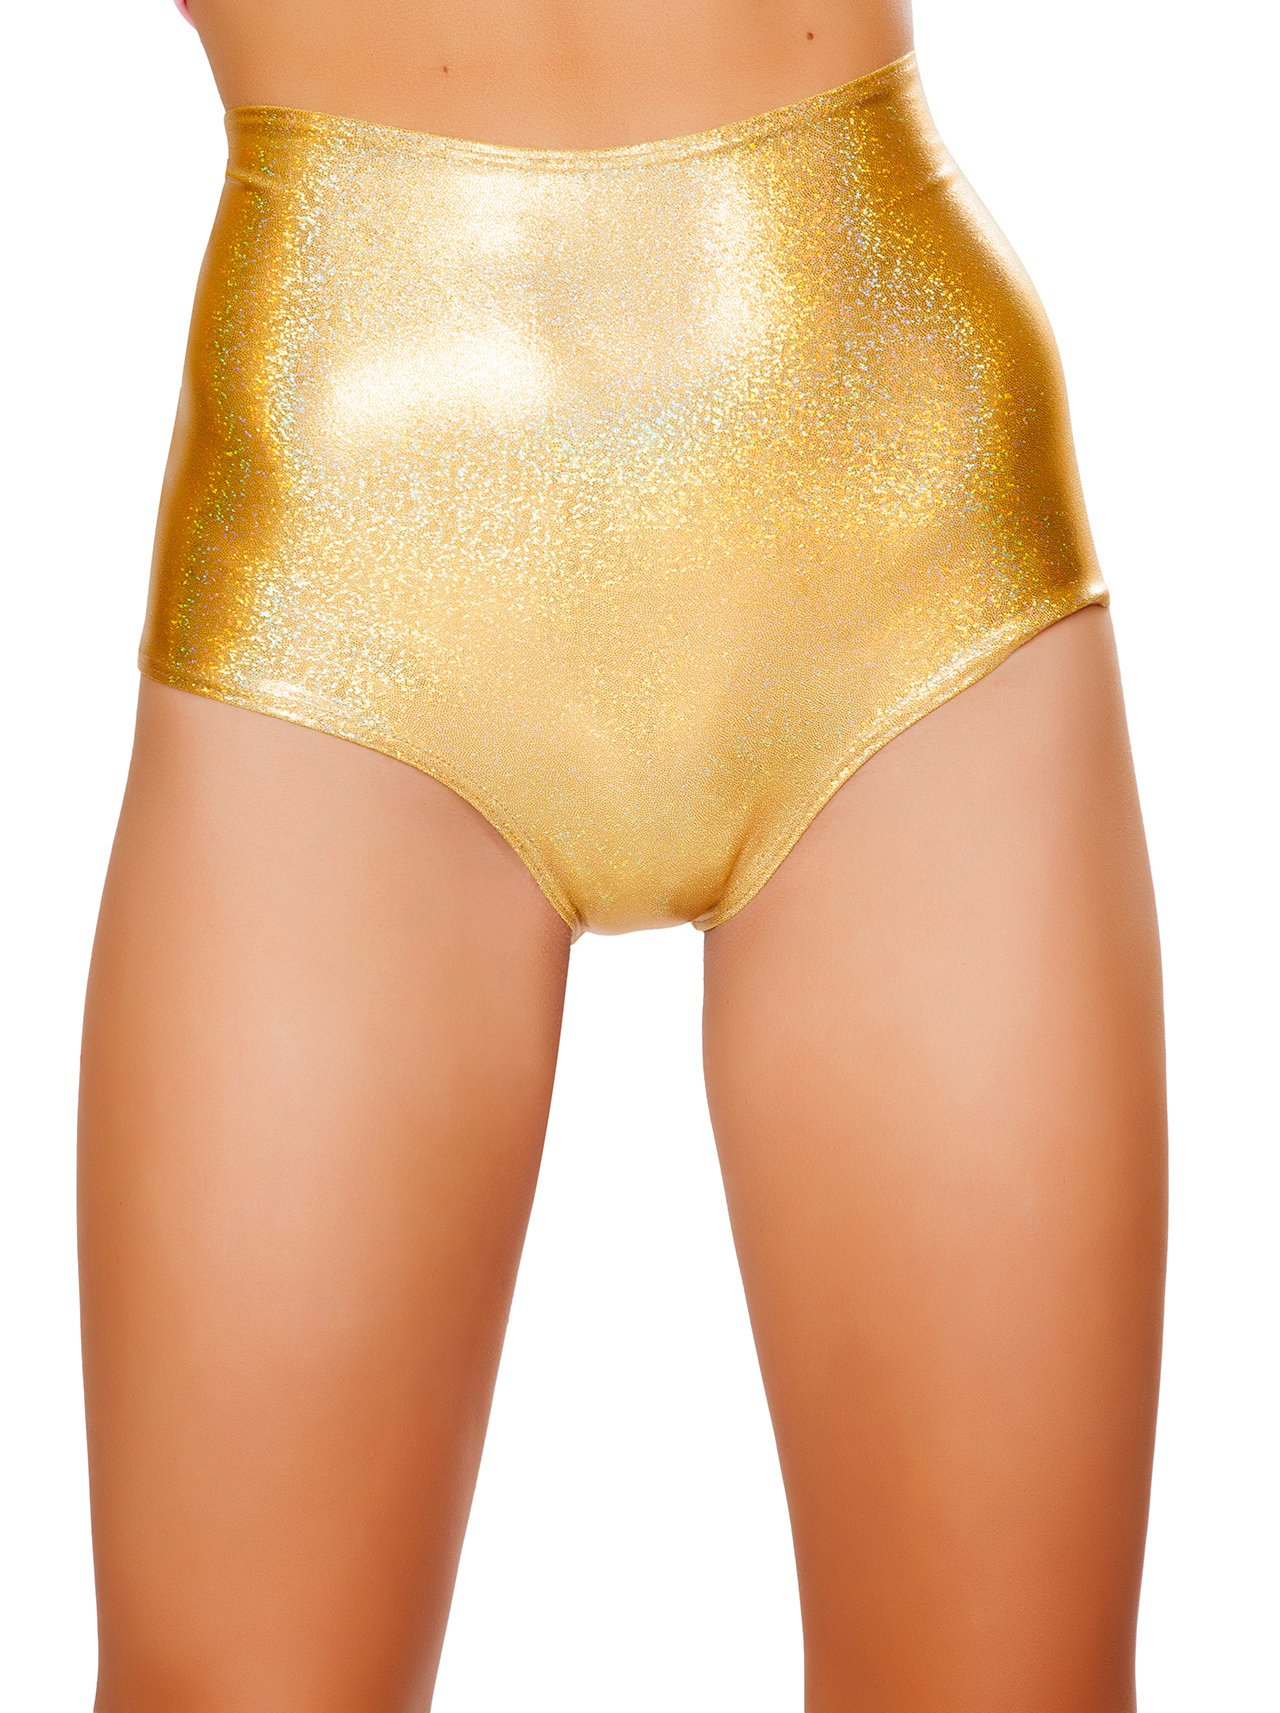 J. Valentine Women's High-Waist Short, Gold, Small/Medium